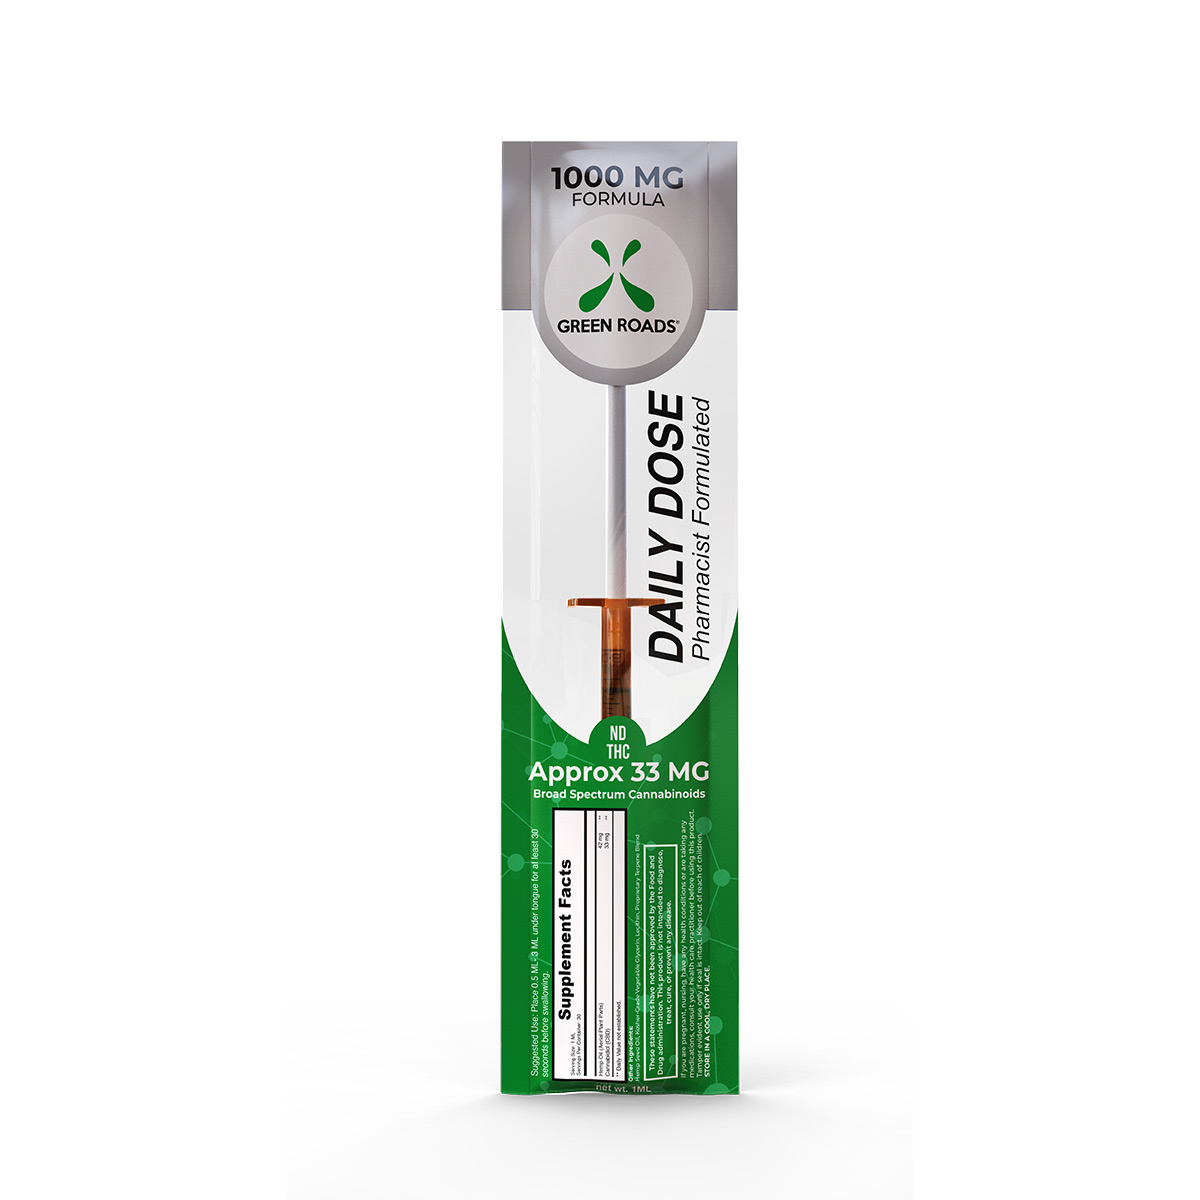 CBD Daily Dose – 1000 mg Formula Green Roads CBD